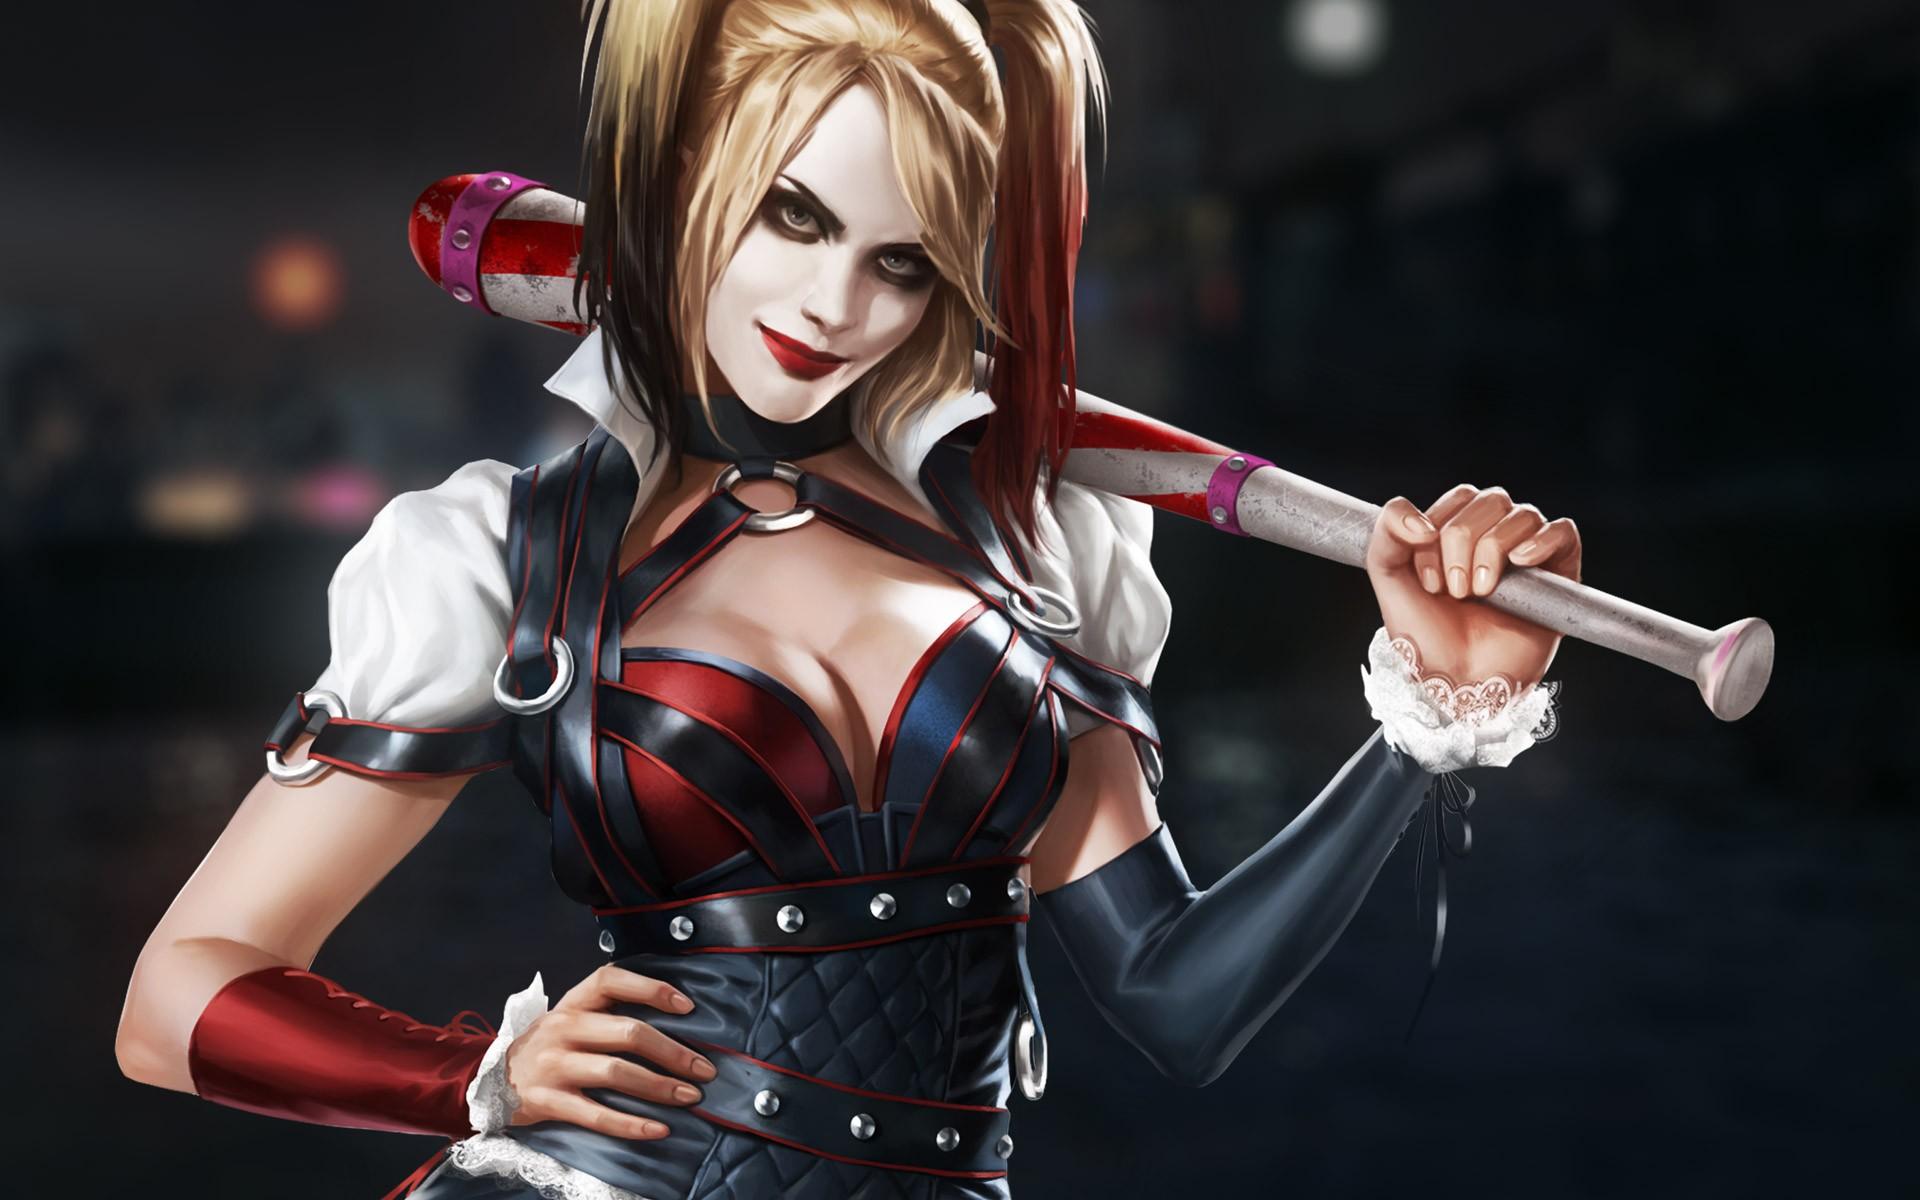 HD Wallpapers Harley Quinn